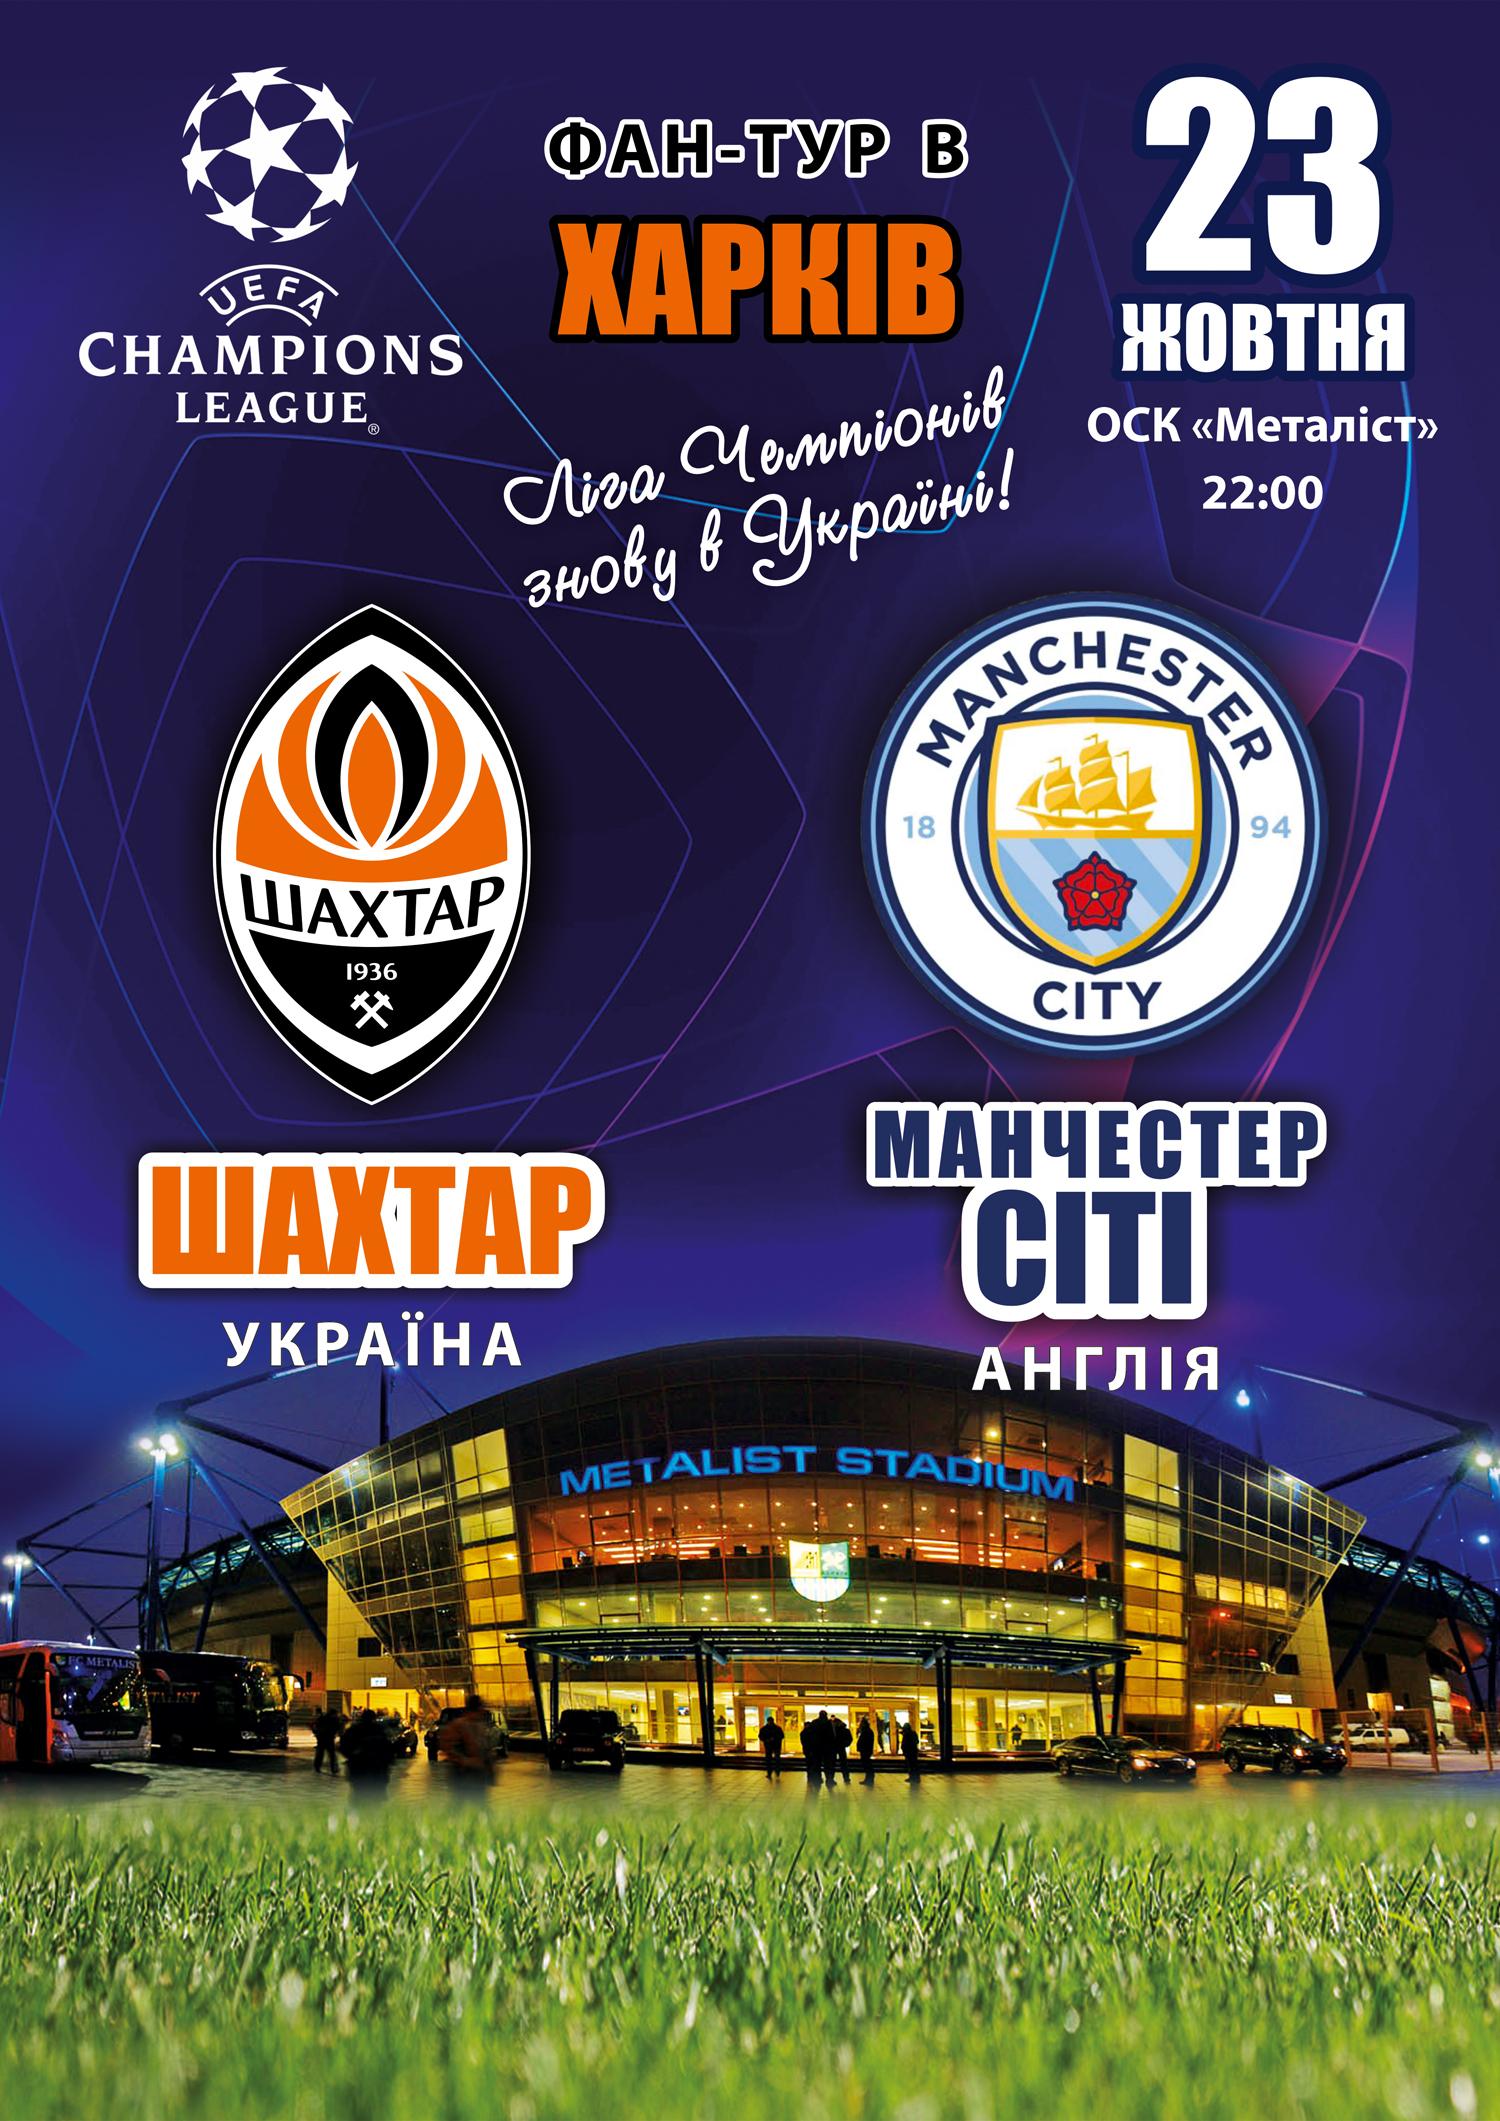 Фан-тур на матч Лиги Чемпионов Шахтер–Манчестер Сити (Сумы)